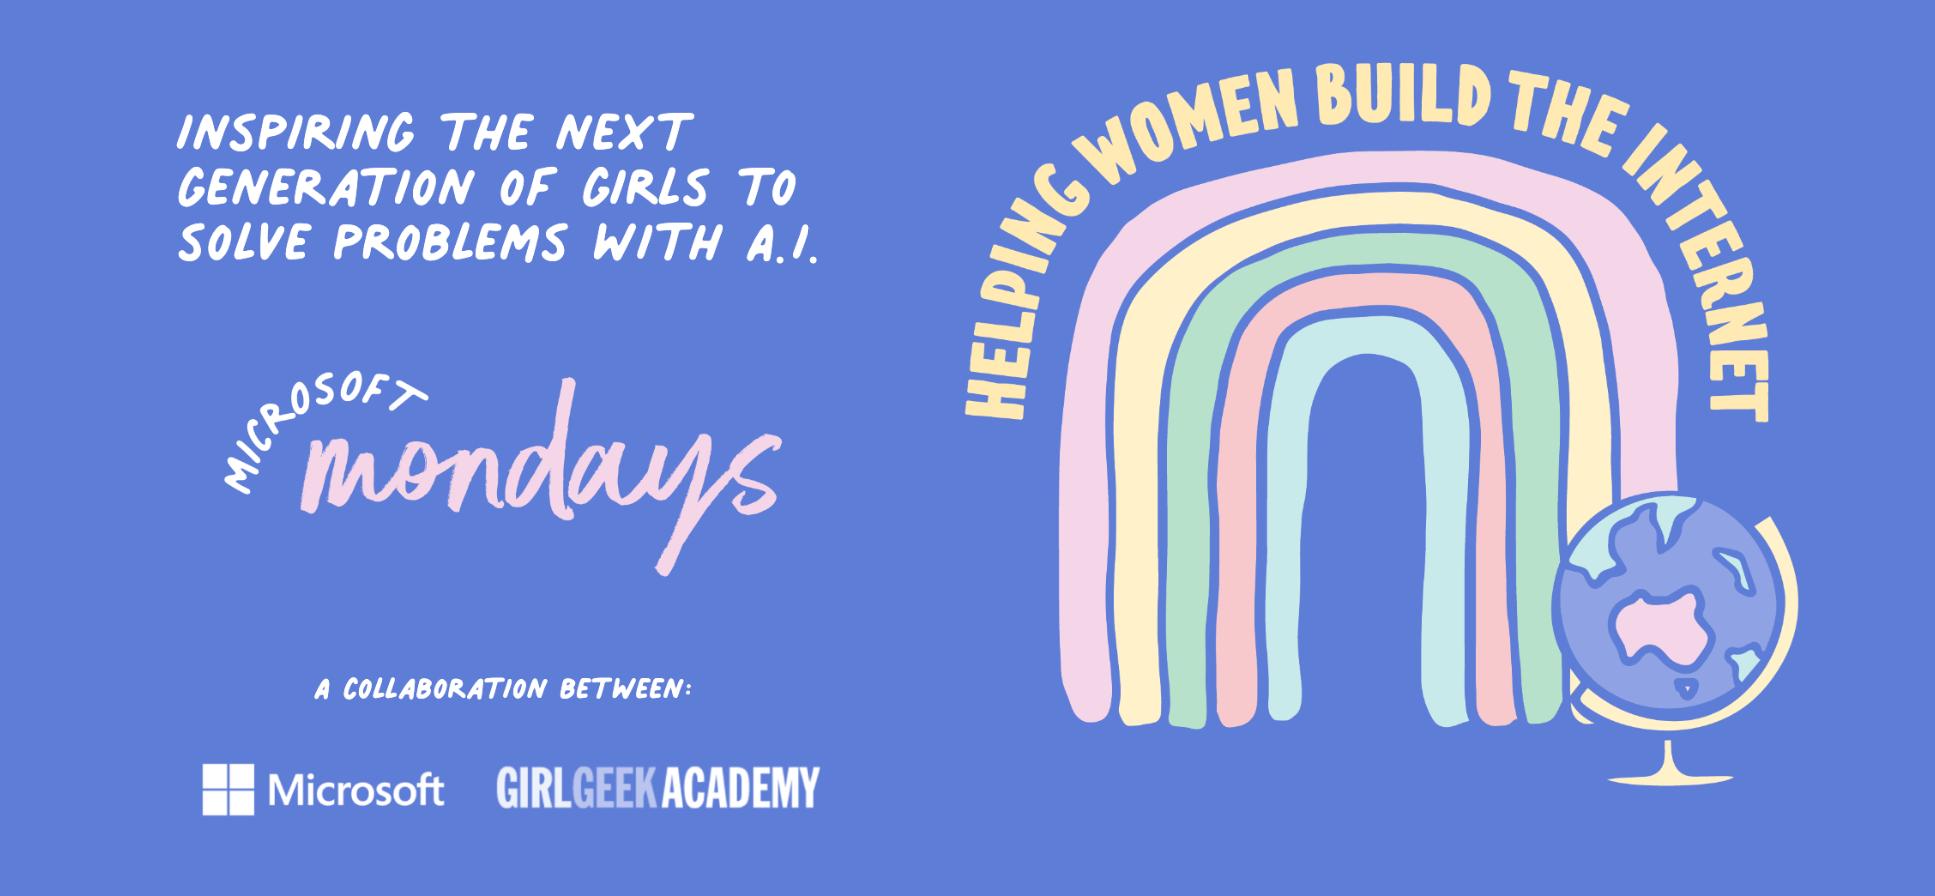 Microsoft Girl Geek Academy banner